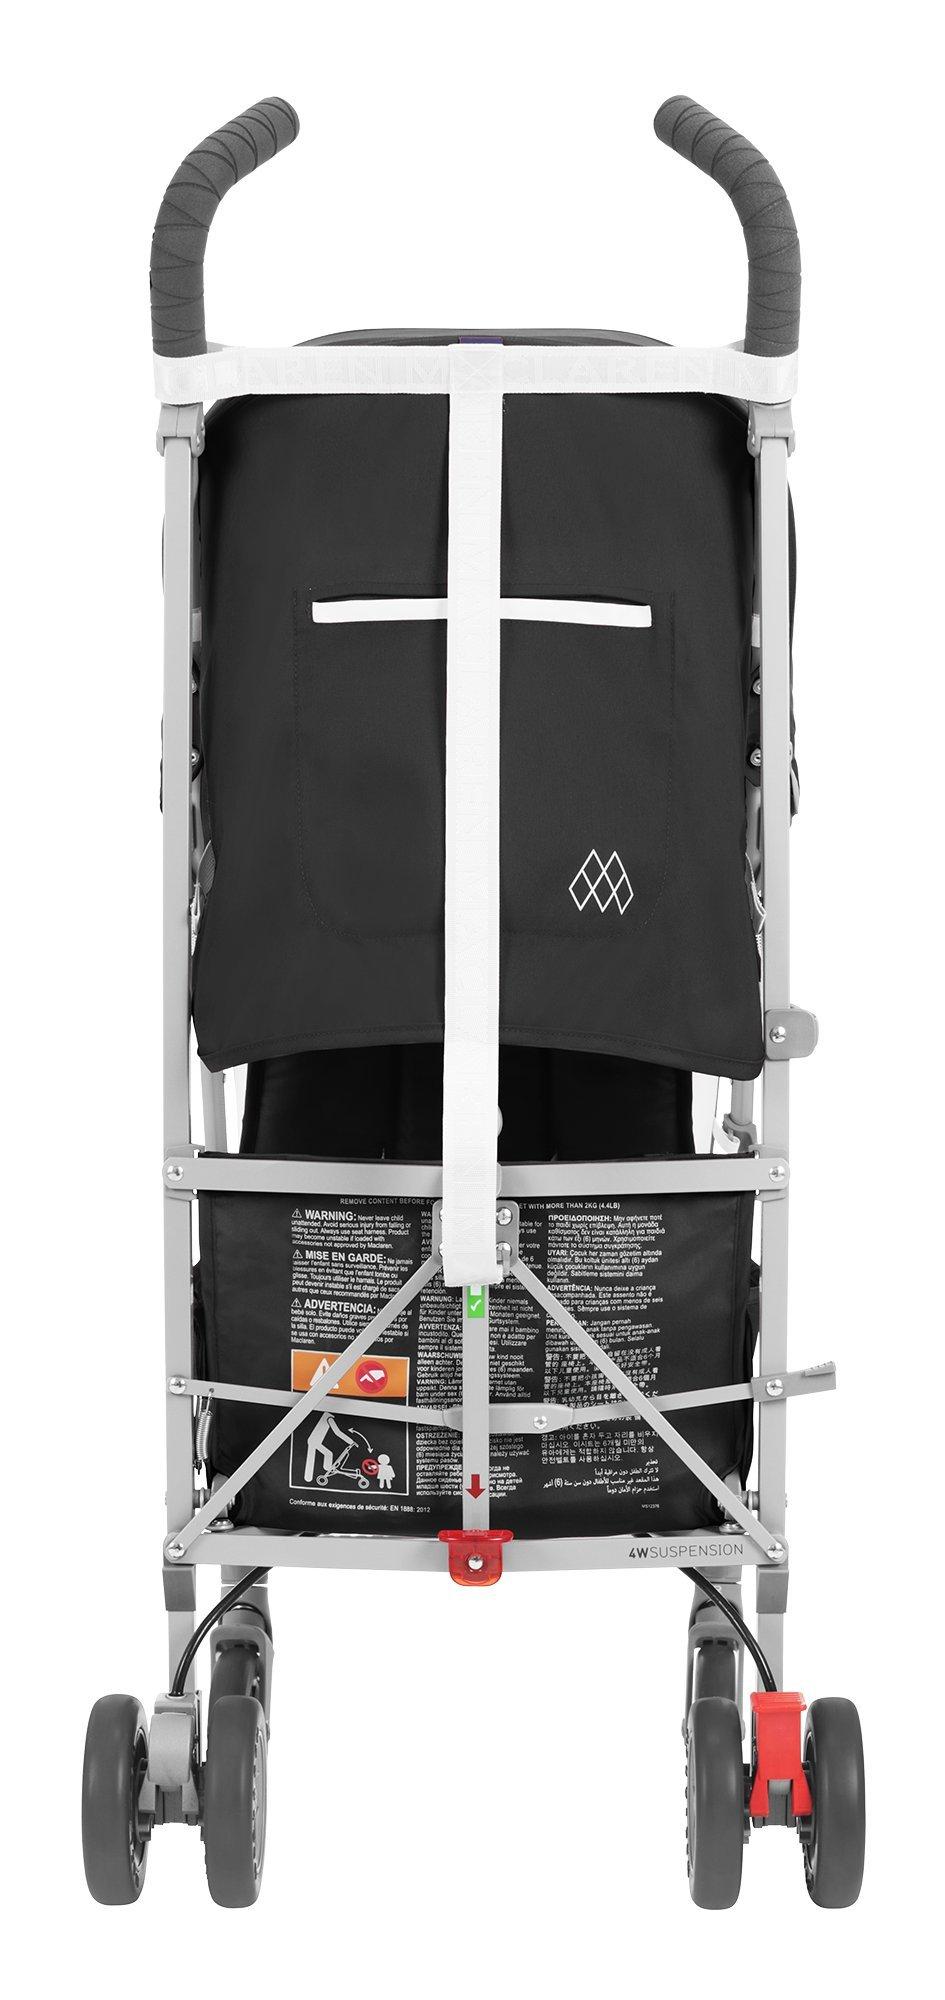 Maclaren Globetrotter Stroller - lightweight, compact by Maclaren (Image #2)